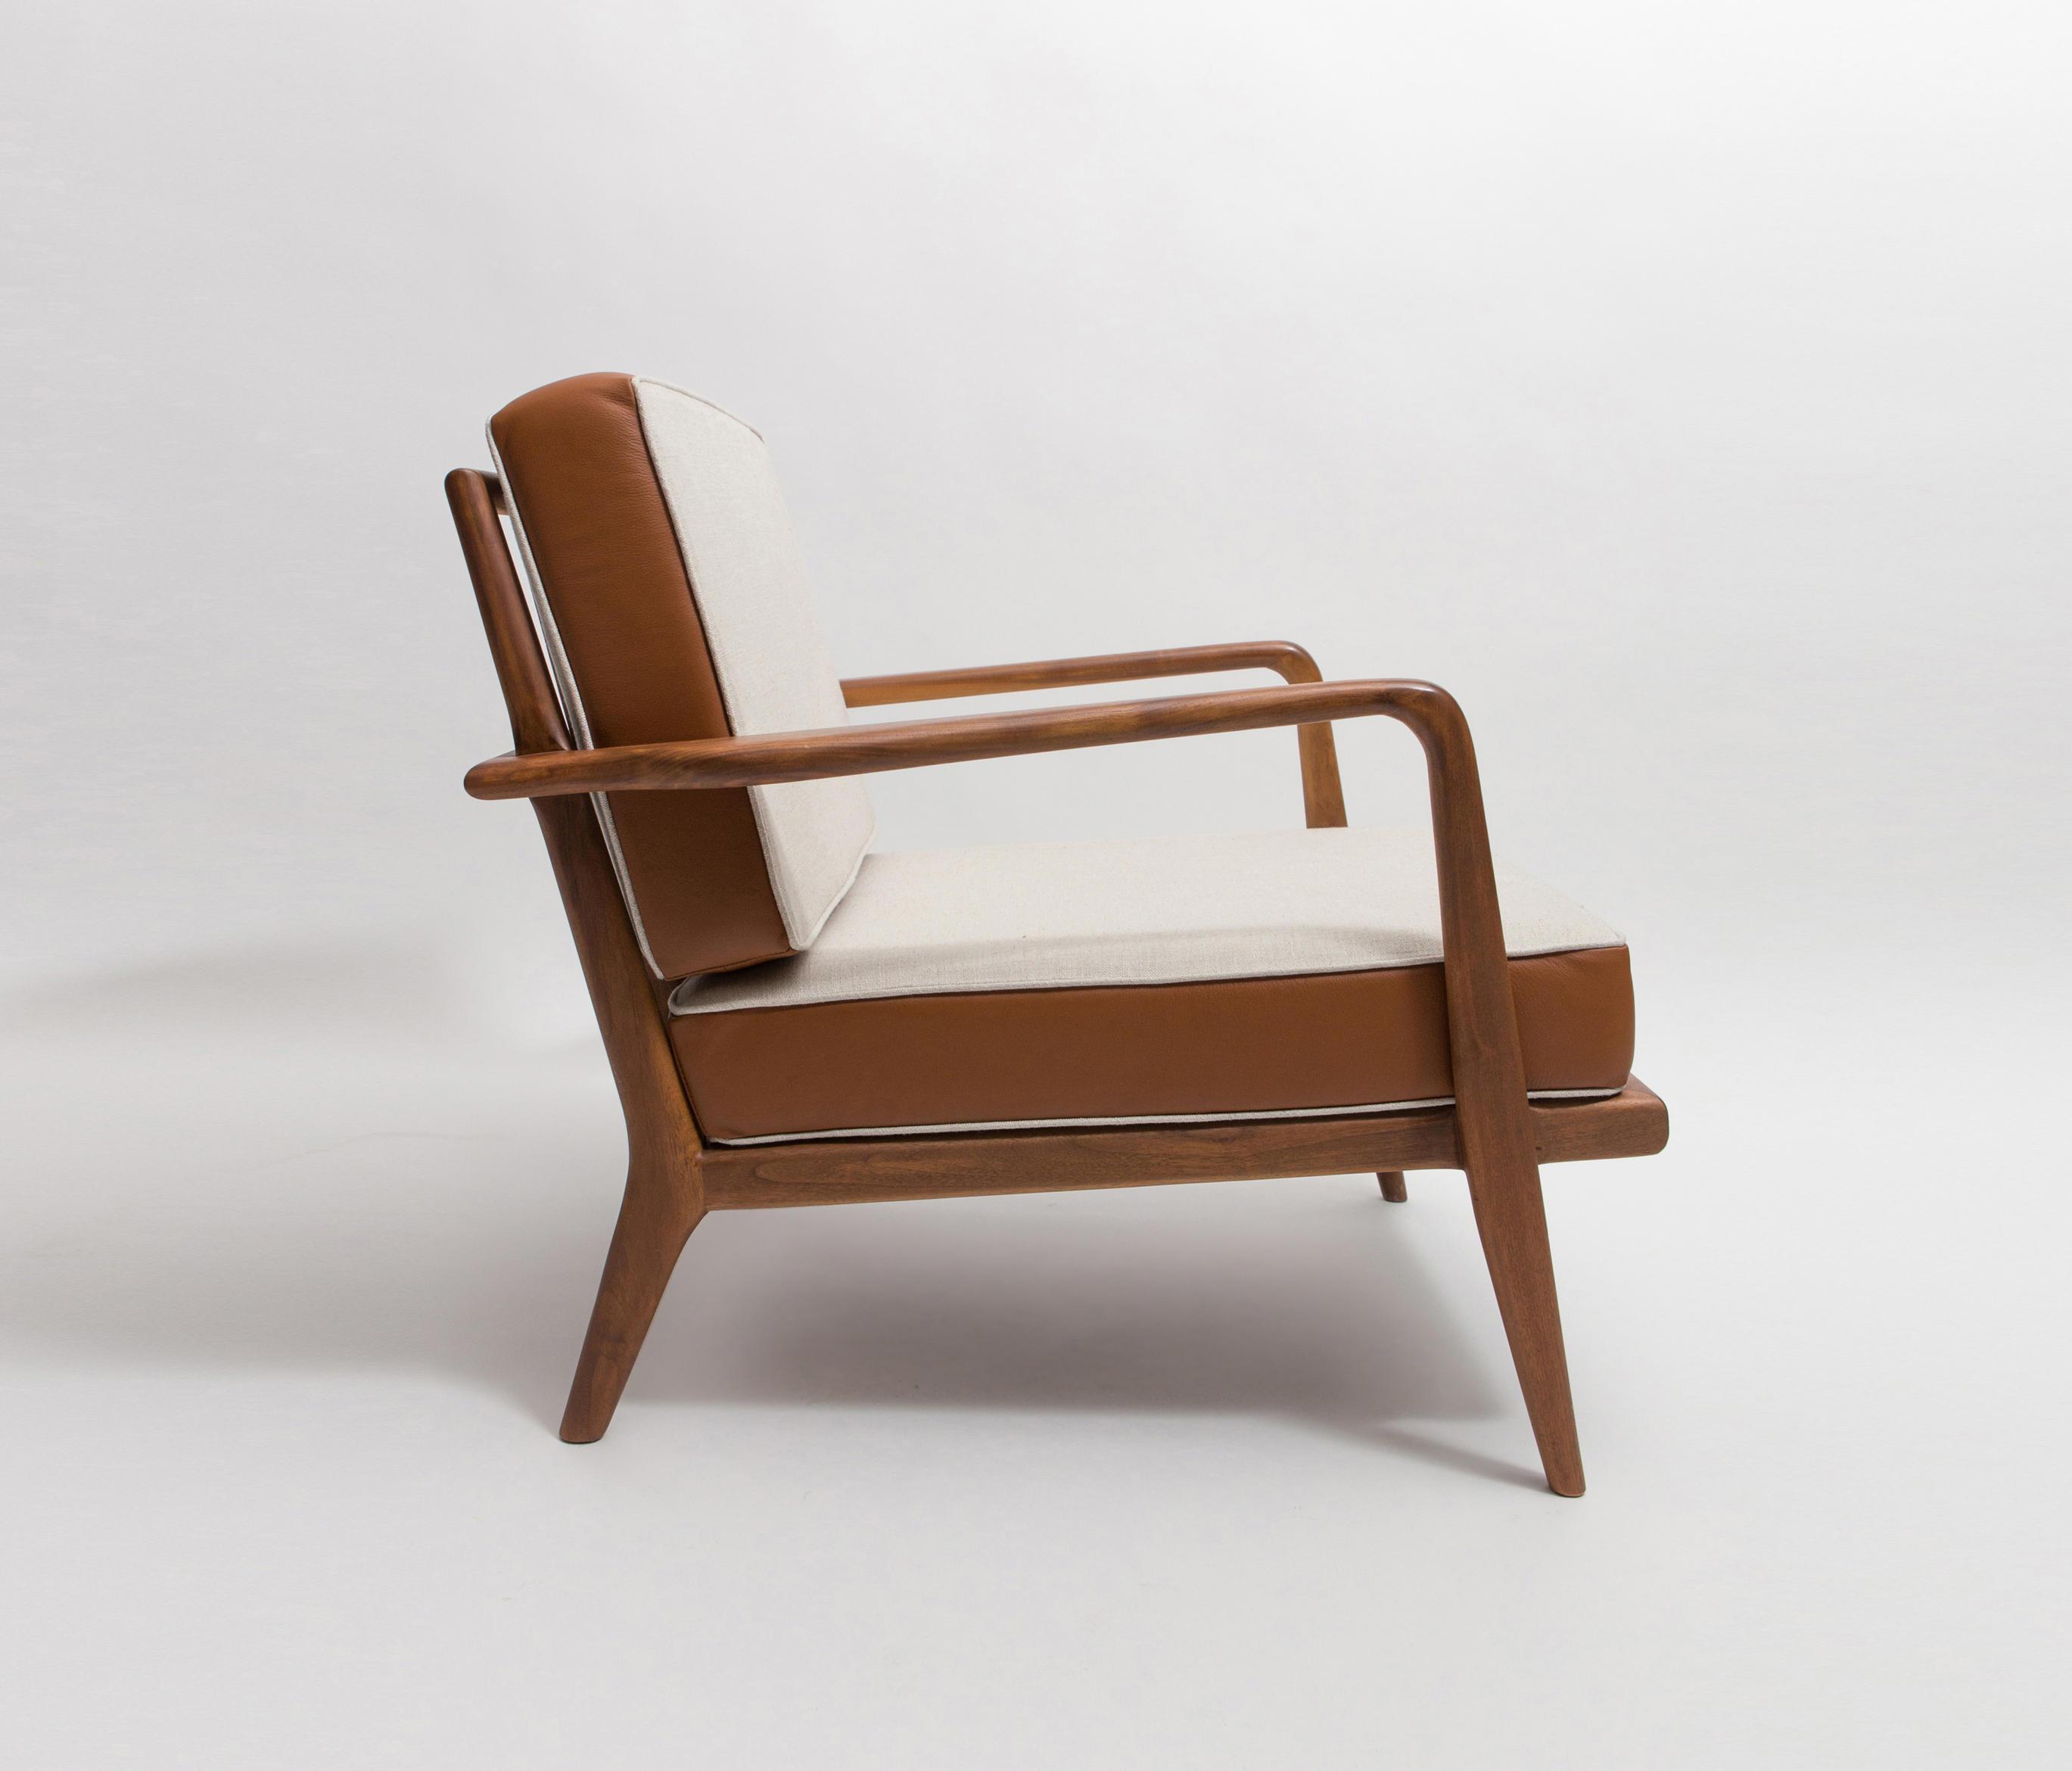 Commode chair definition commode chair definition commode for Furniture definition